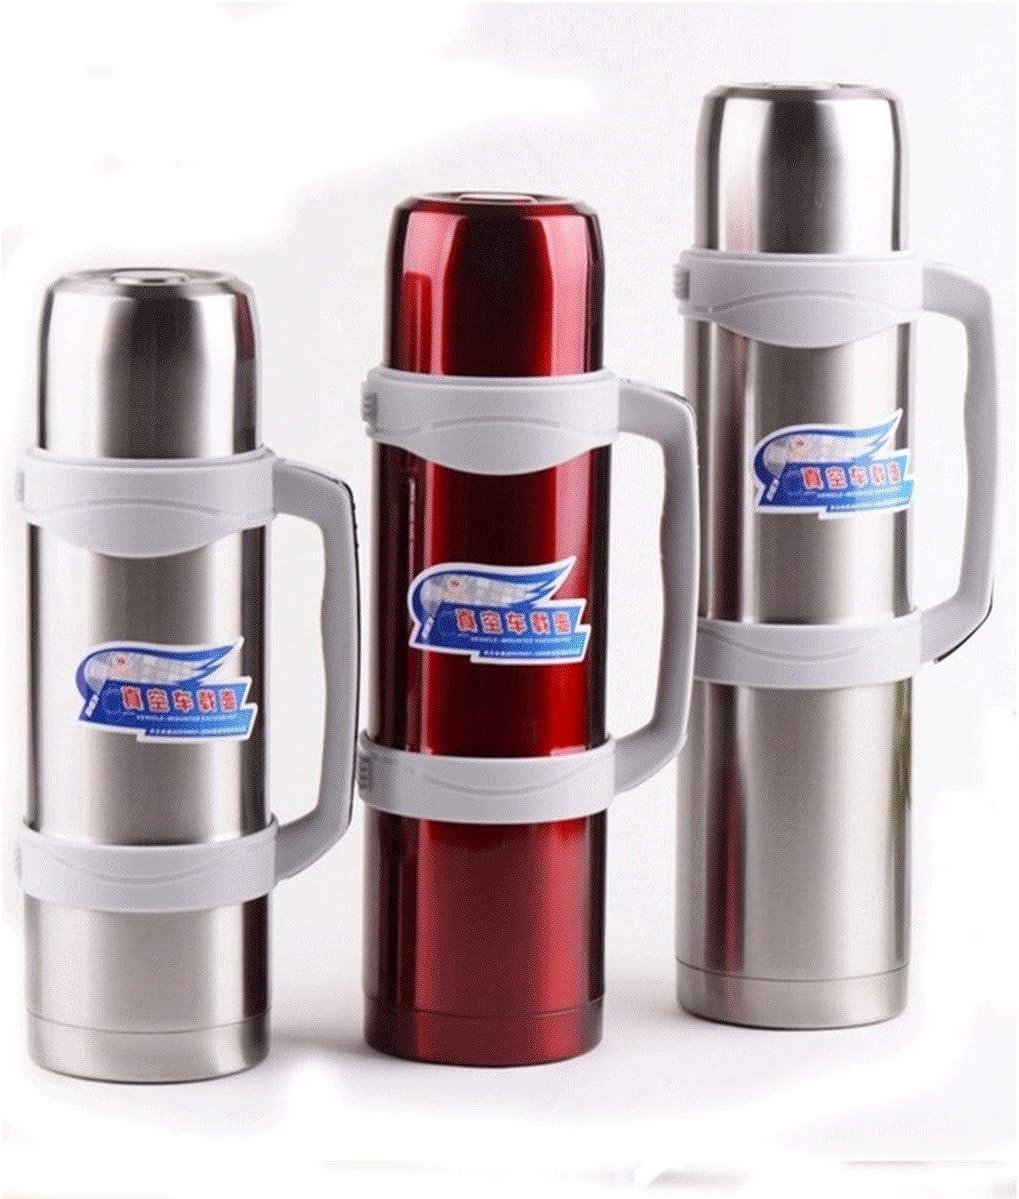 TPXR カー断熱ポット、大容量、ステンレス鋼真空フラスコ、真空アウトドア旅行旅行湯たんぽ、屋外断熱ポット、2.6L / 3.5L / 3.0L、スチールカラー/赤 (Color : 赤, Size : 2.6L) 赤 2.6L